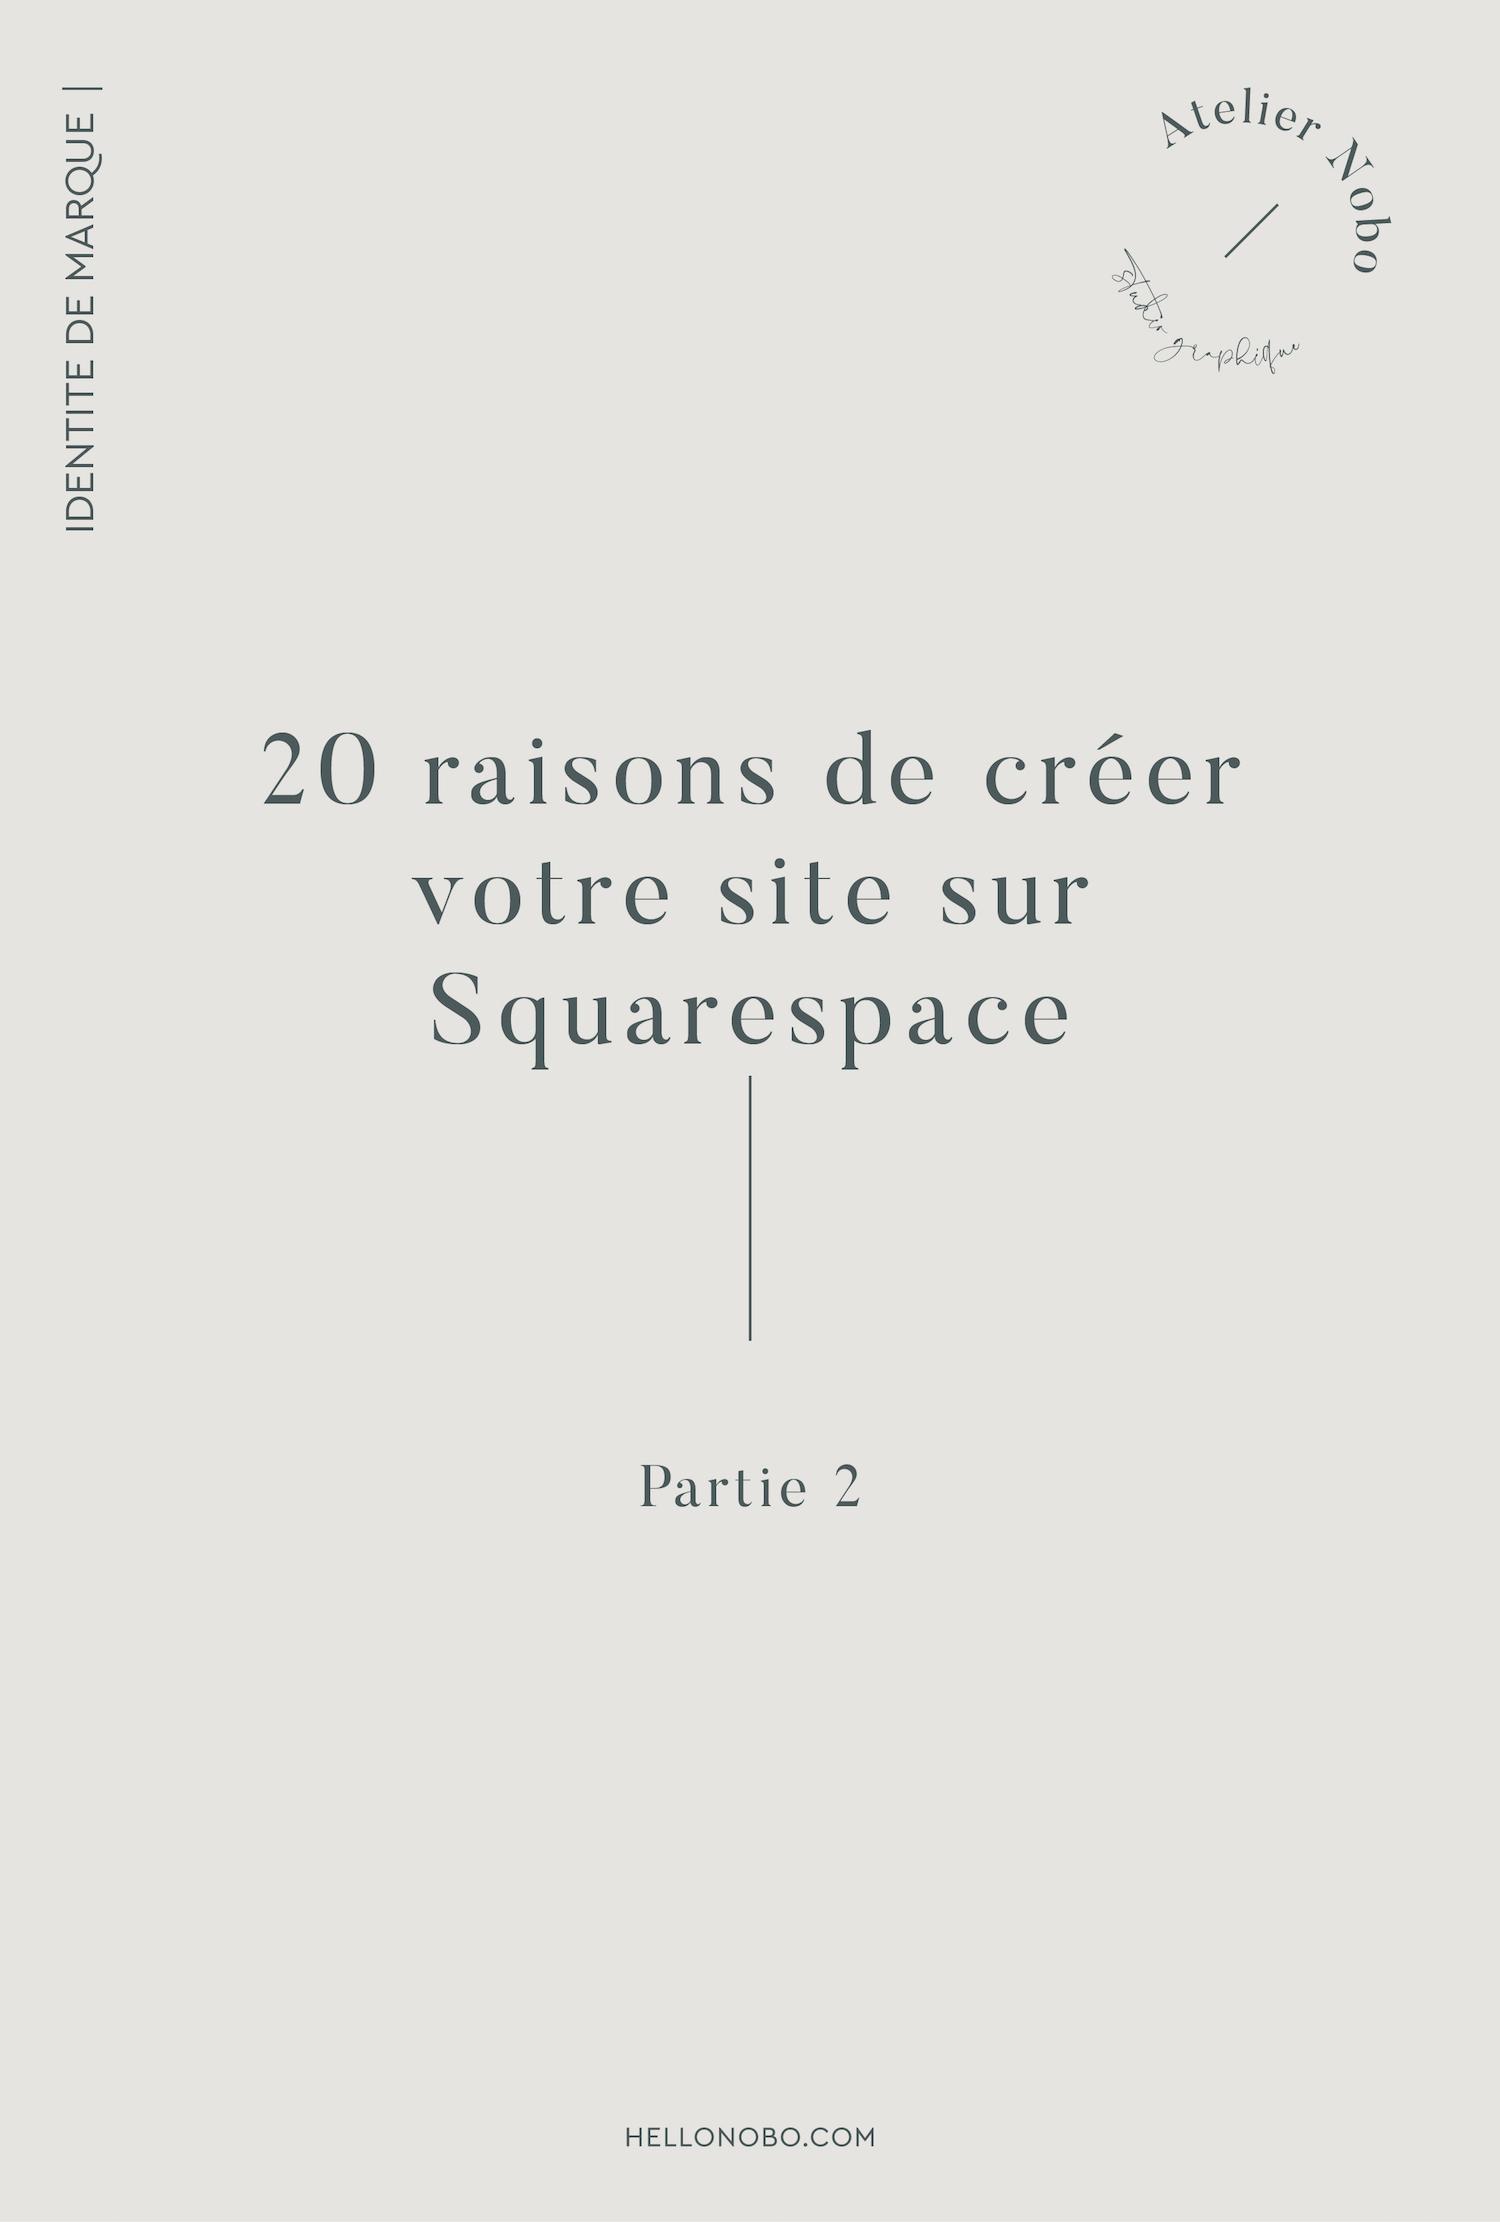 20 raisons squarespace 2.jpg